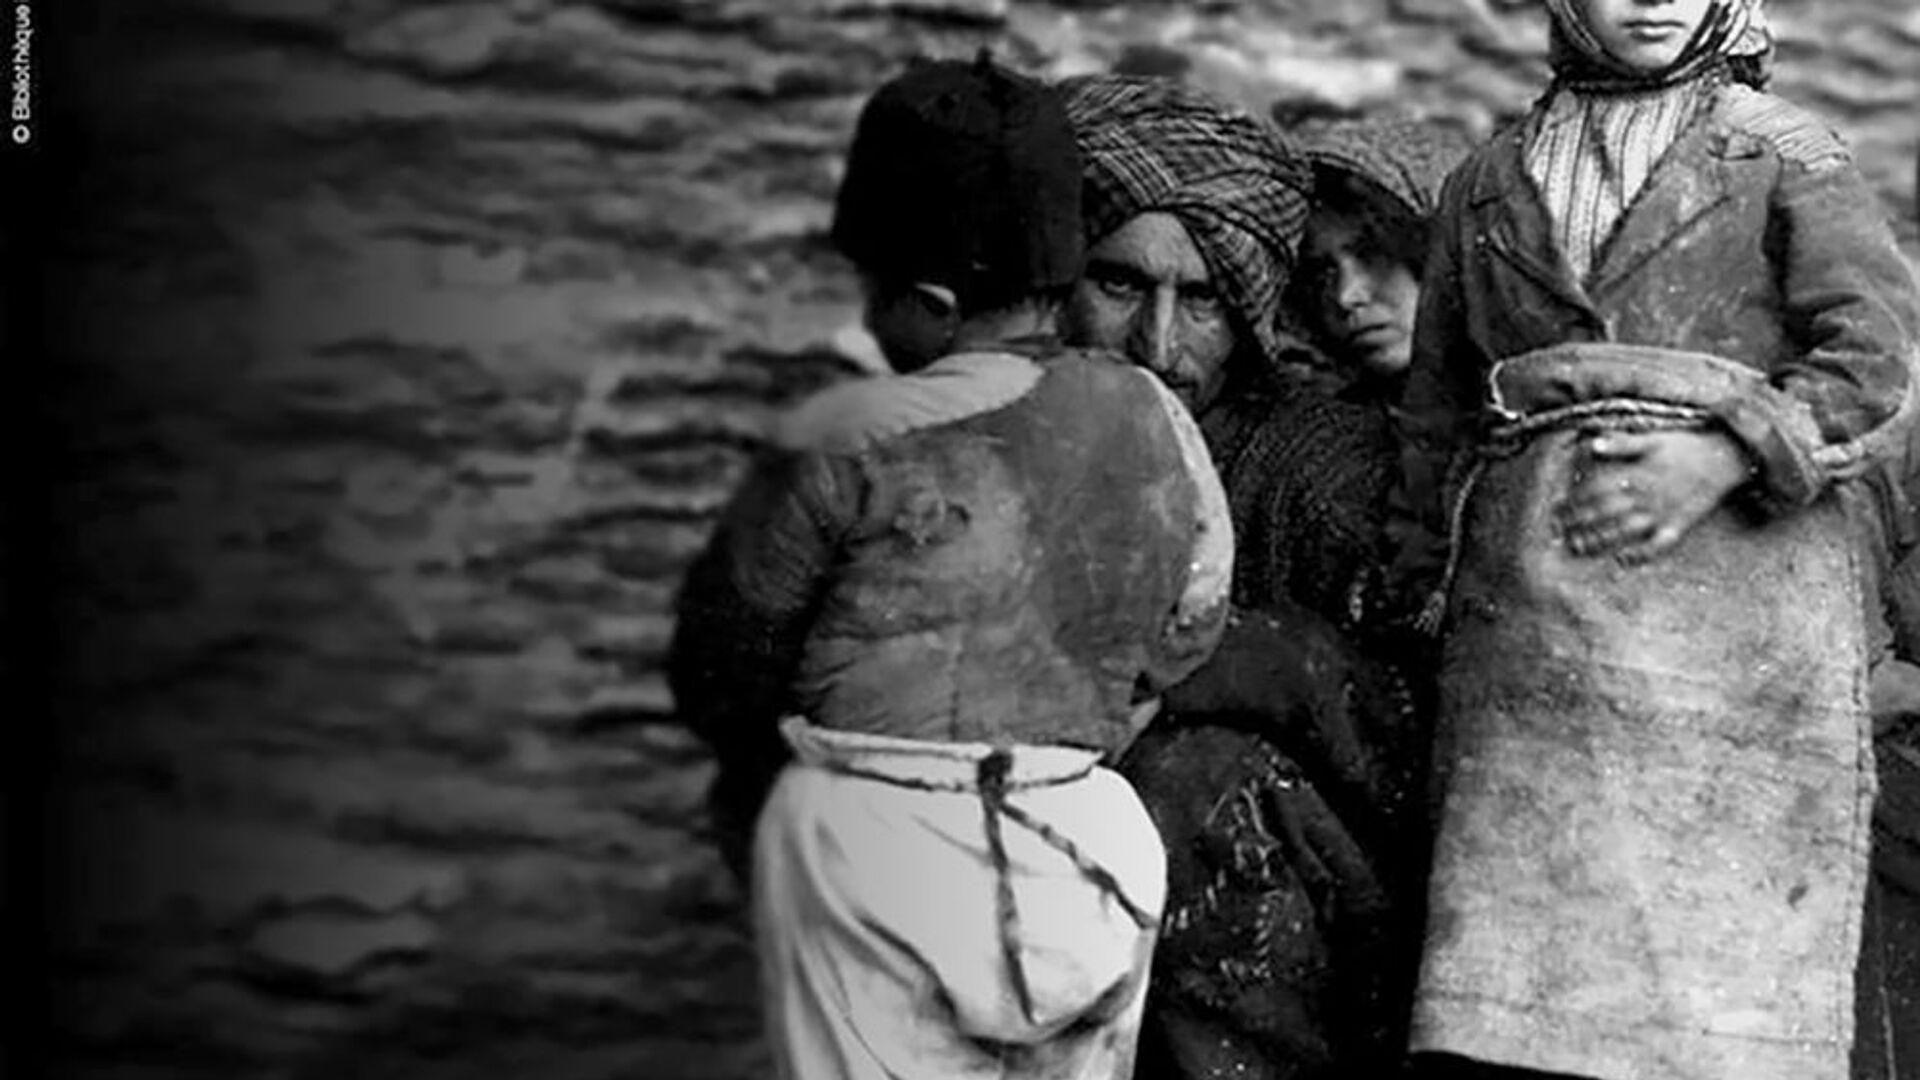 Армянские сироты - Sputnik Արմենիա, 1920, 27.09.2021